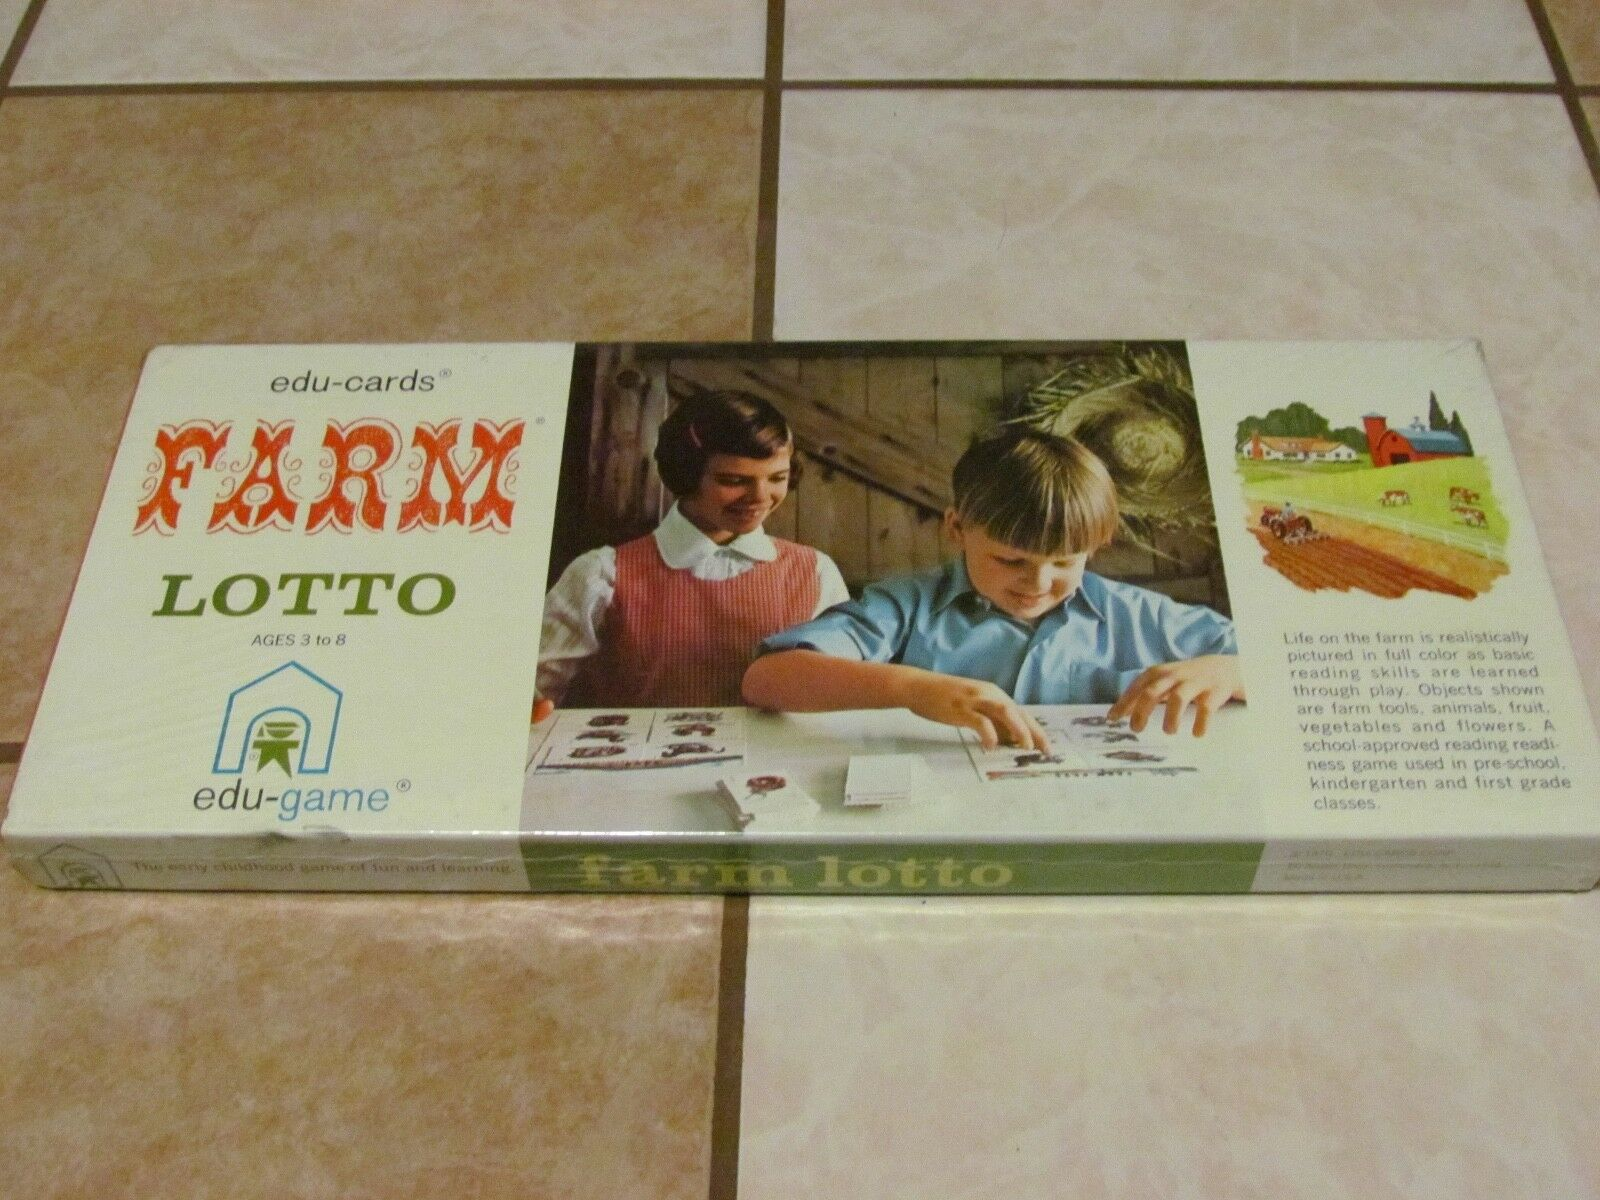 nuovo SEALED EDU-autoDS FARM LOTTO 1970 EDU-gioco RARE VINTAGE divertimento  LEARNING  in vendita